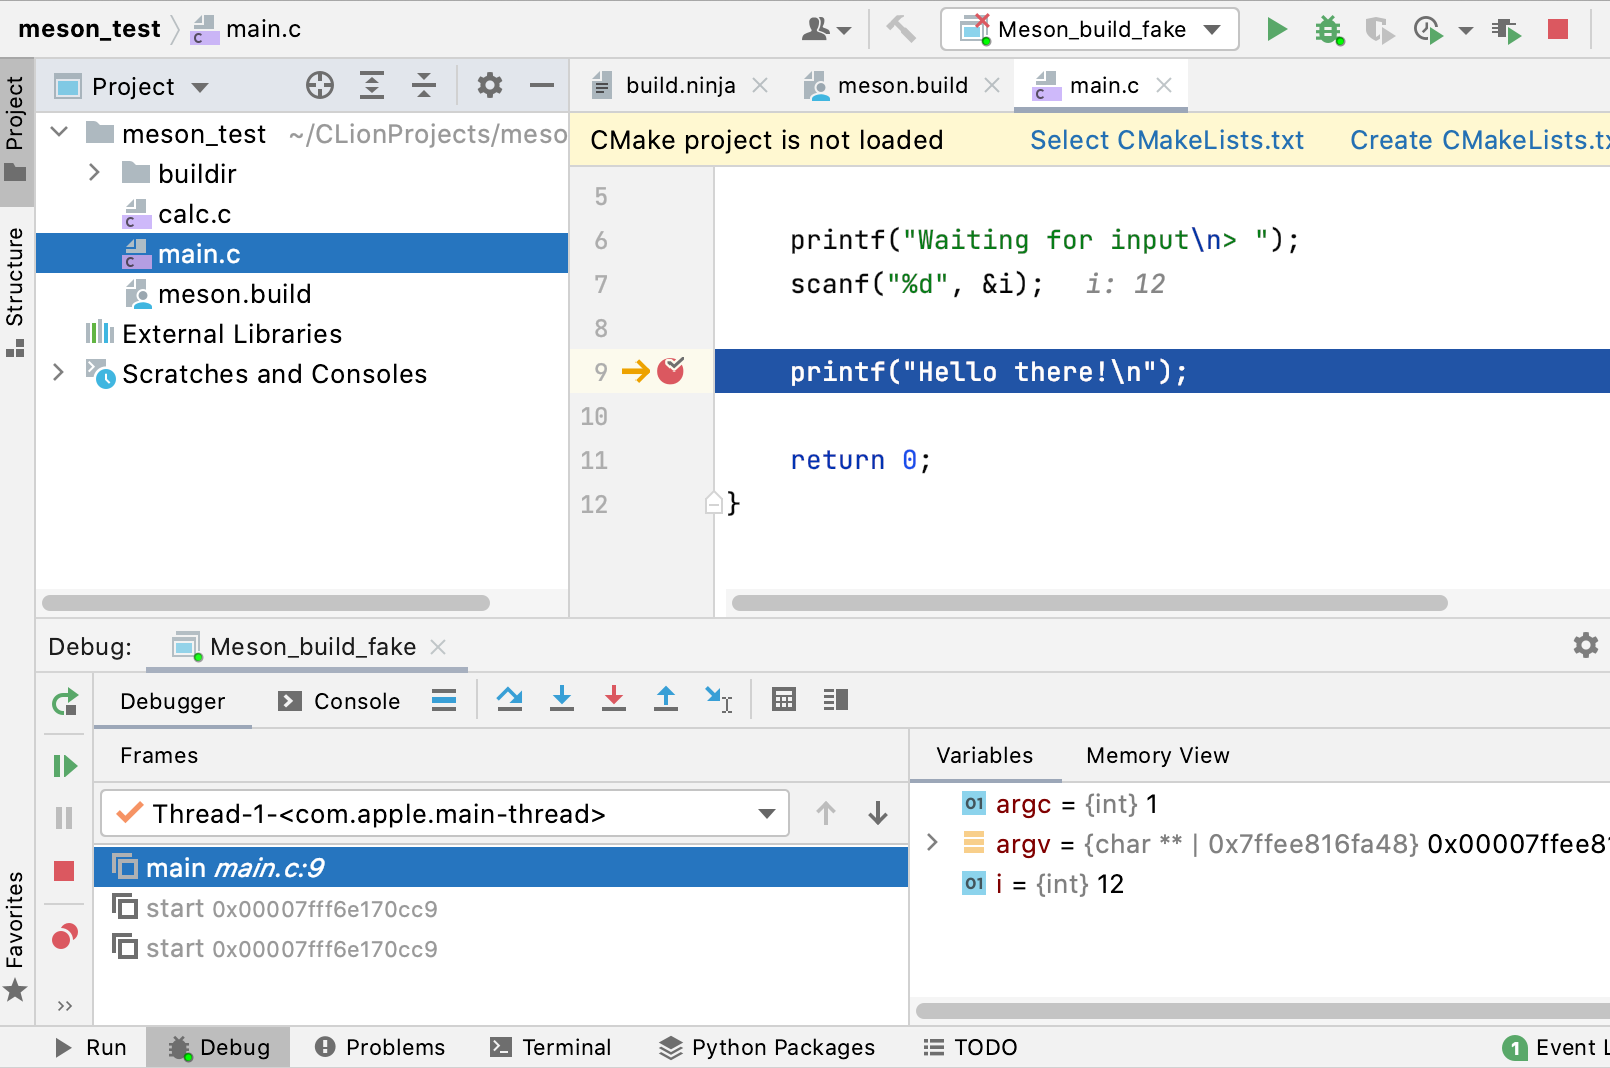 Debugging a custom build application